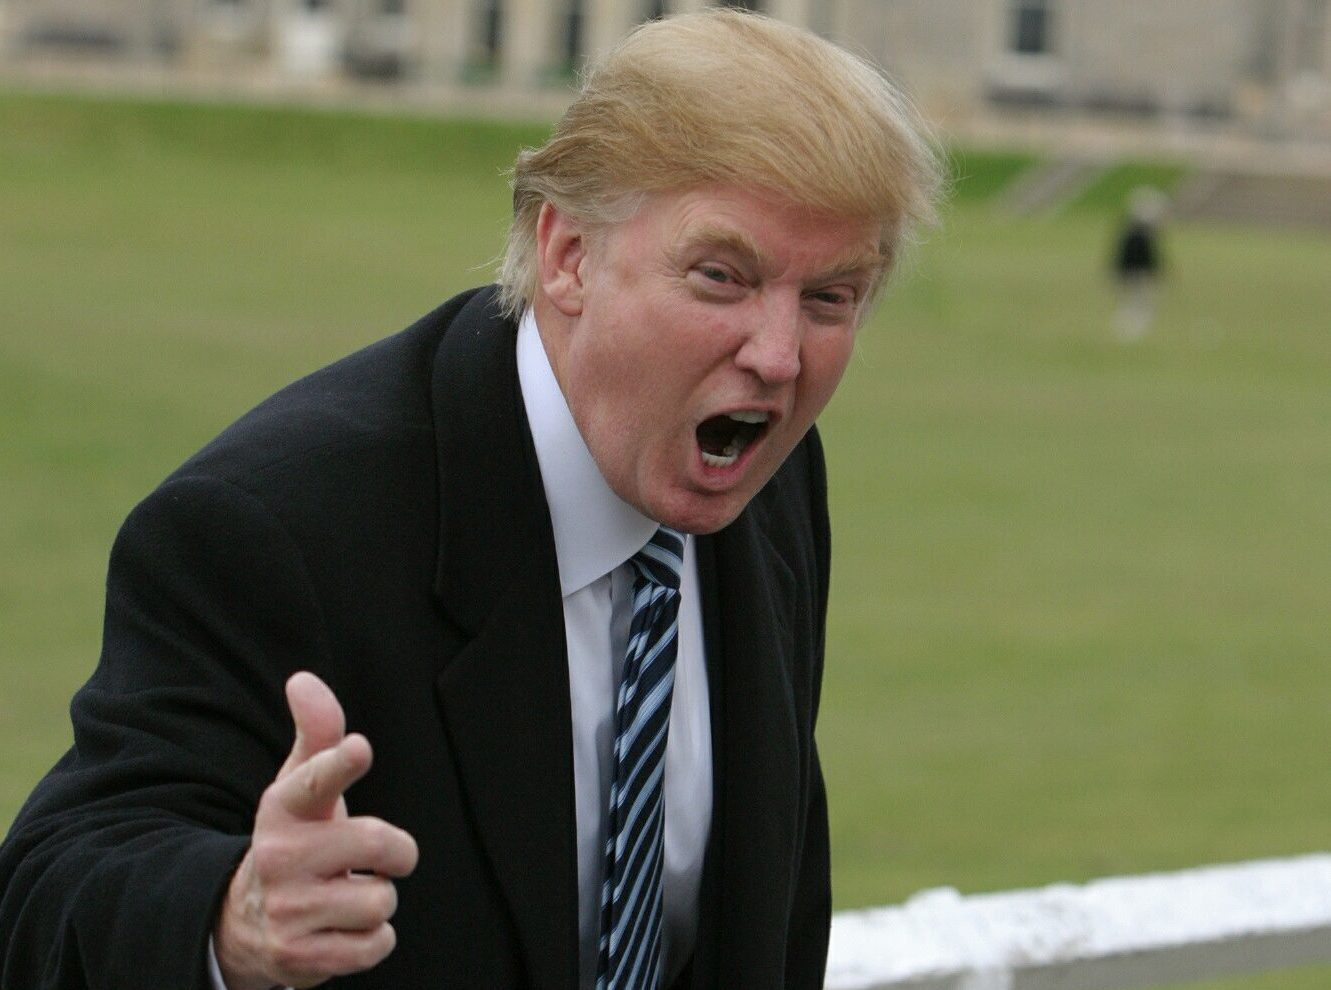 Donald Trump is not happy.